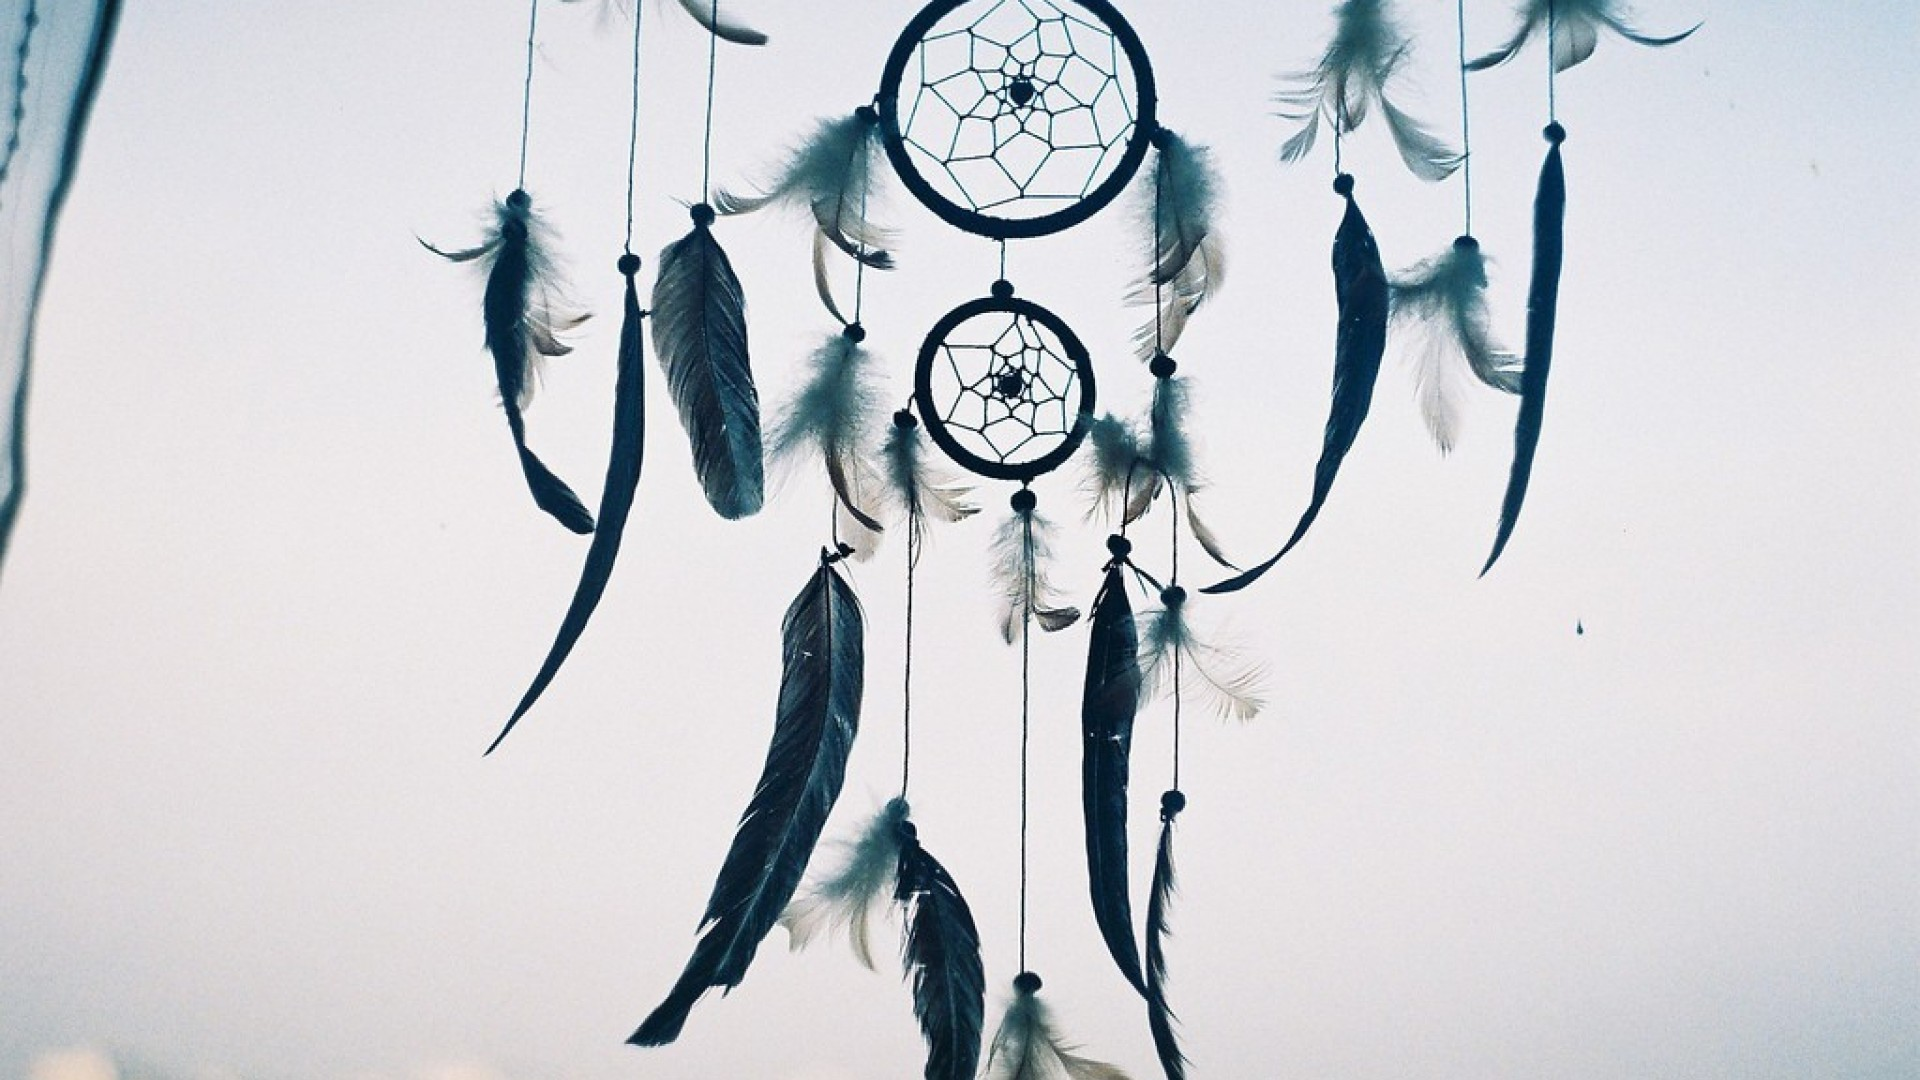 Dreamcatcher-Wallpaper-HD-Background-Desktop | - Fondos .